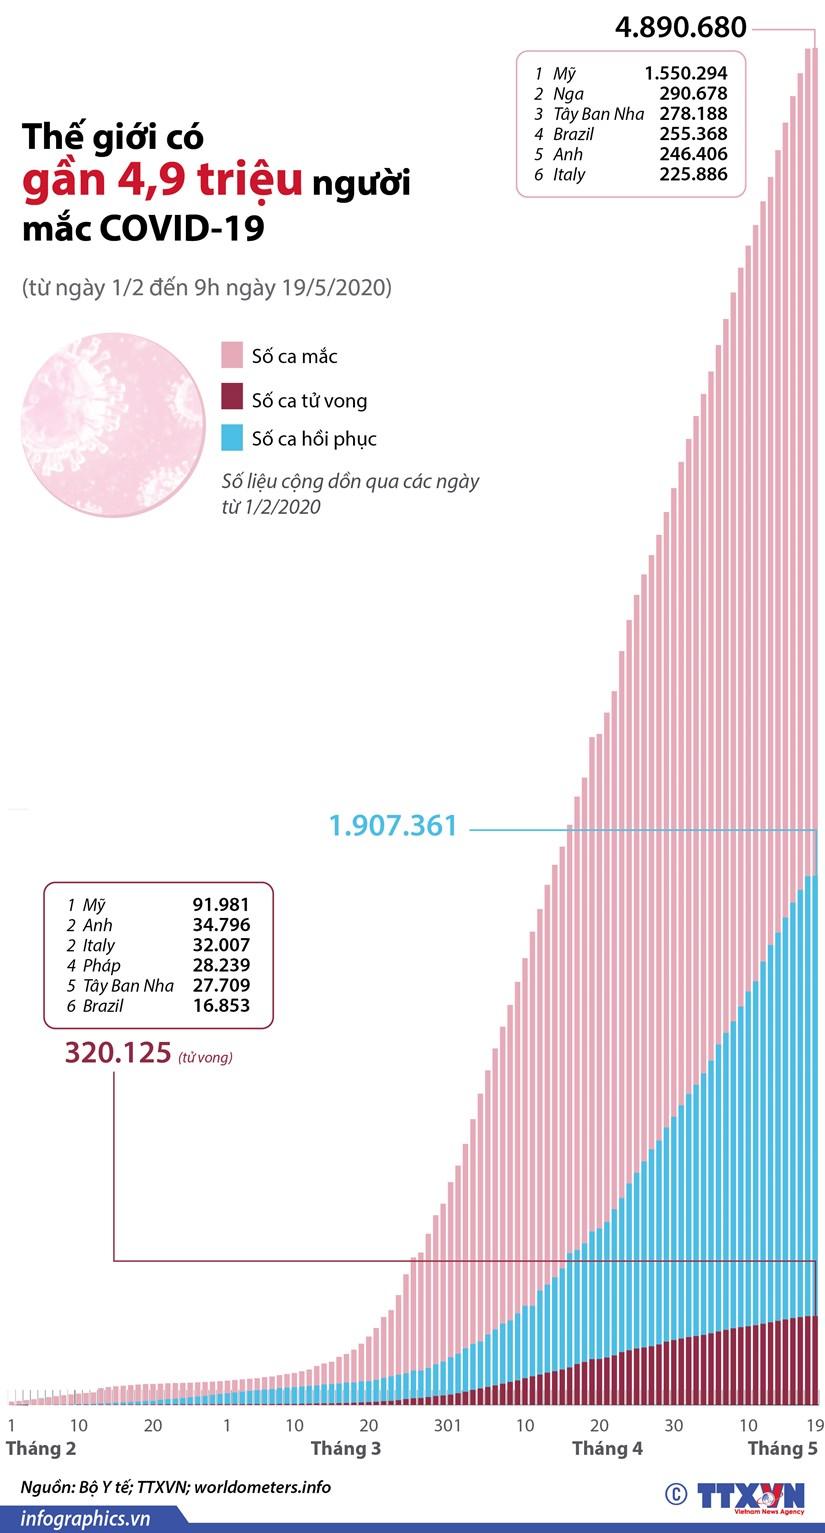 [Infographics] The gioi co gan 4,9 trieu nguoi mac COVID-19 hinh anh 1